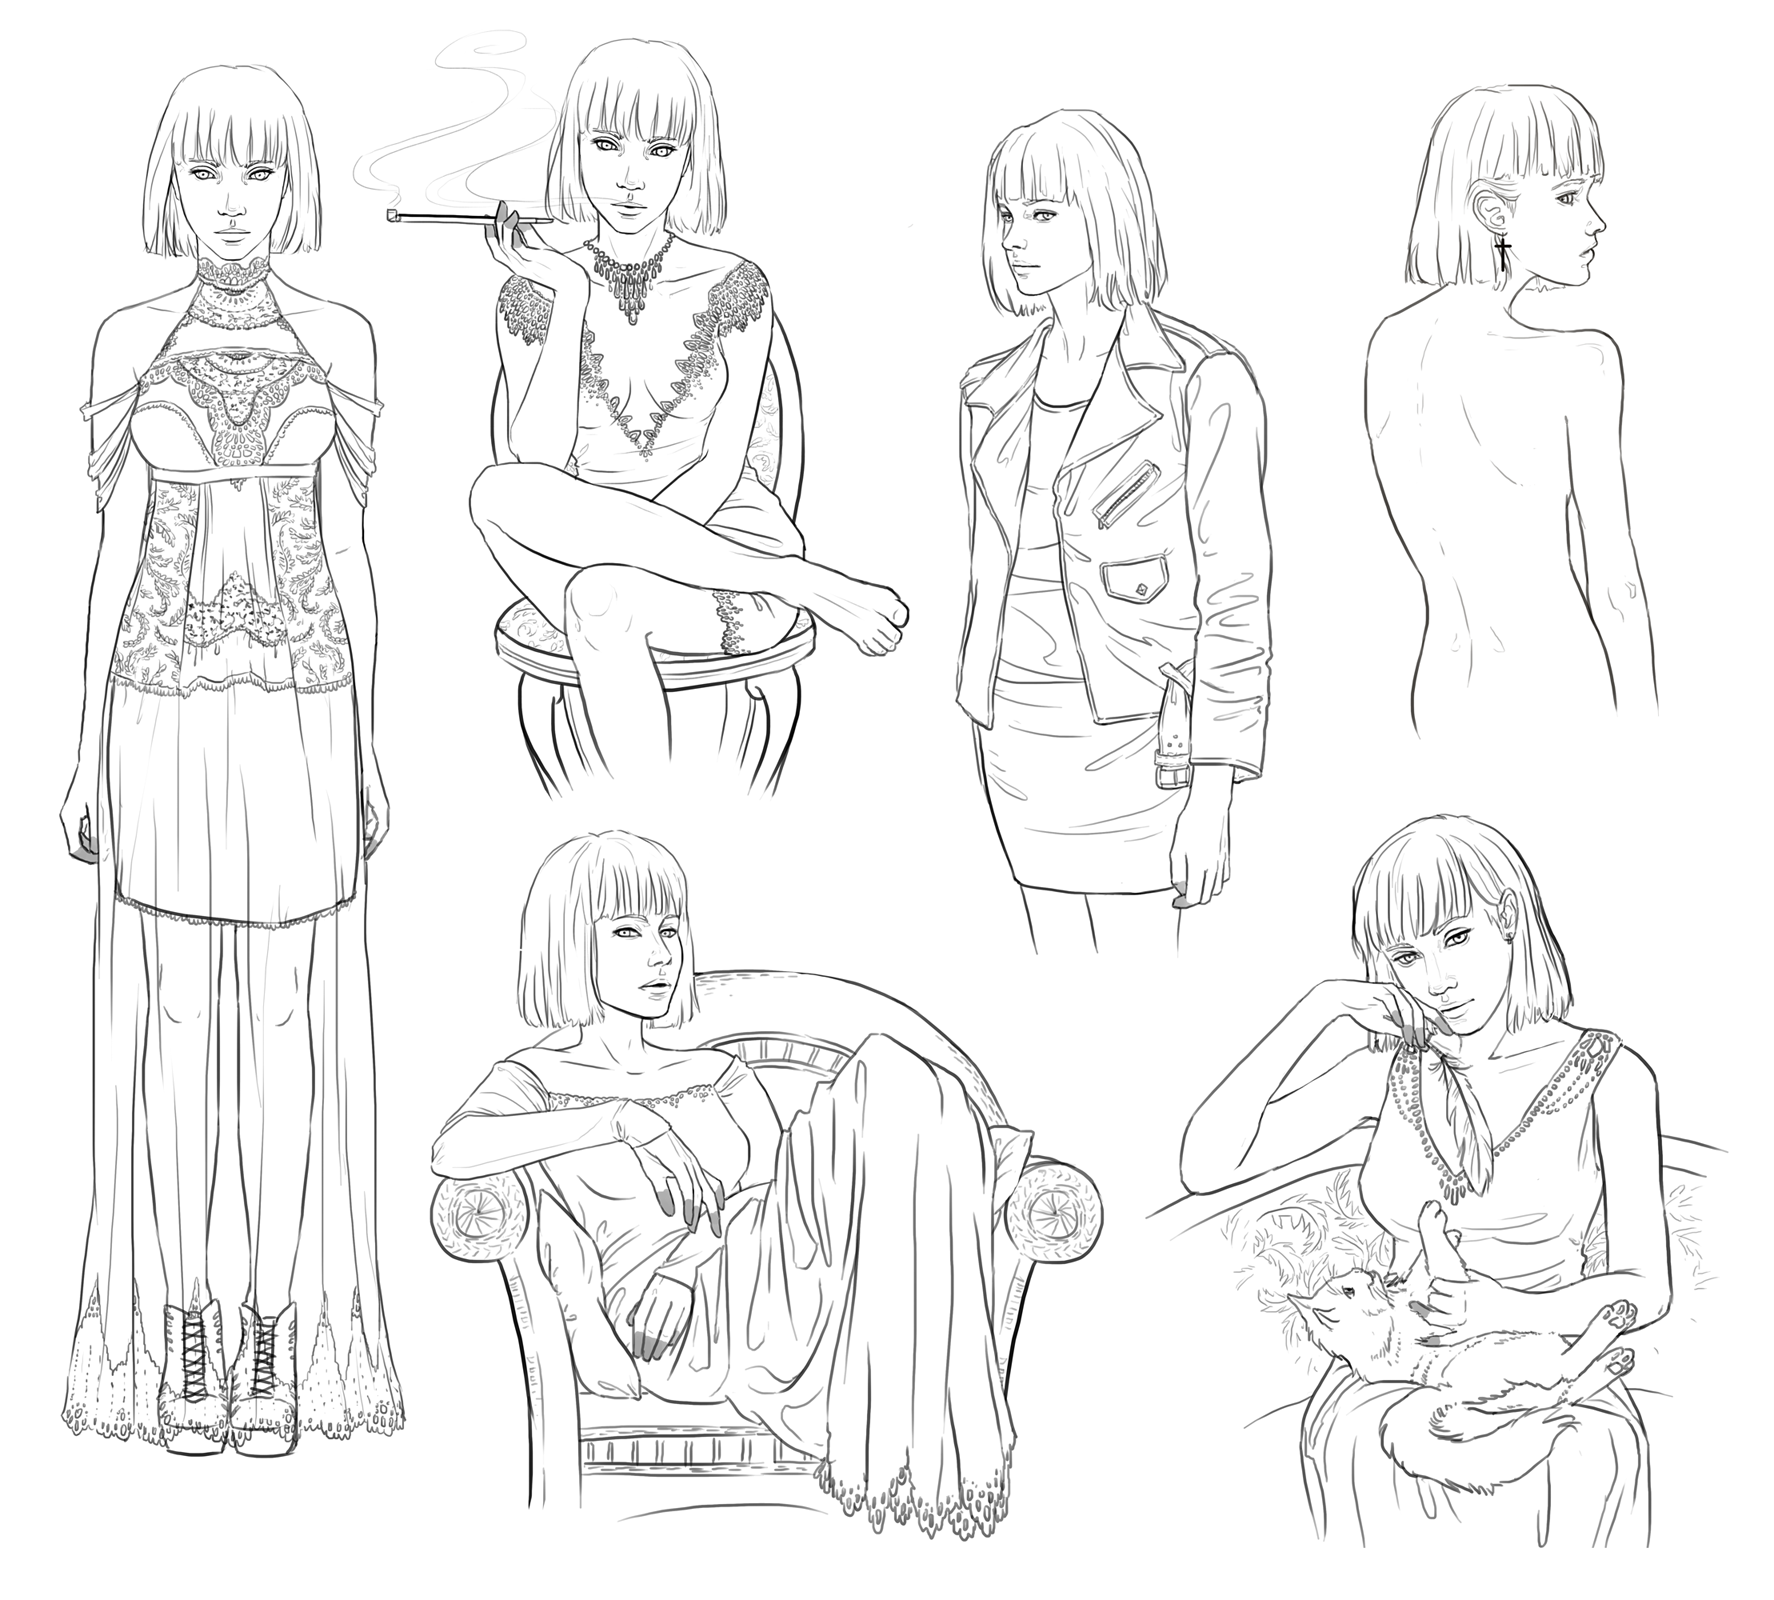 Agata - sketchdump by NImportant